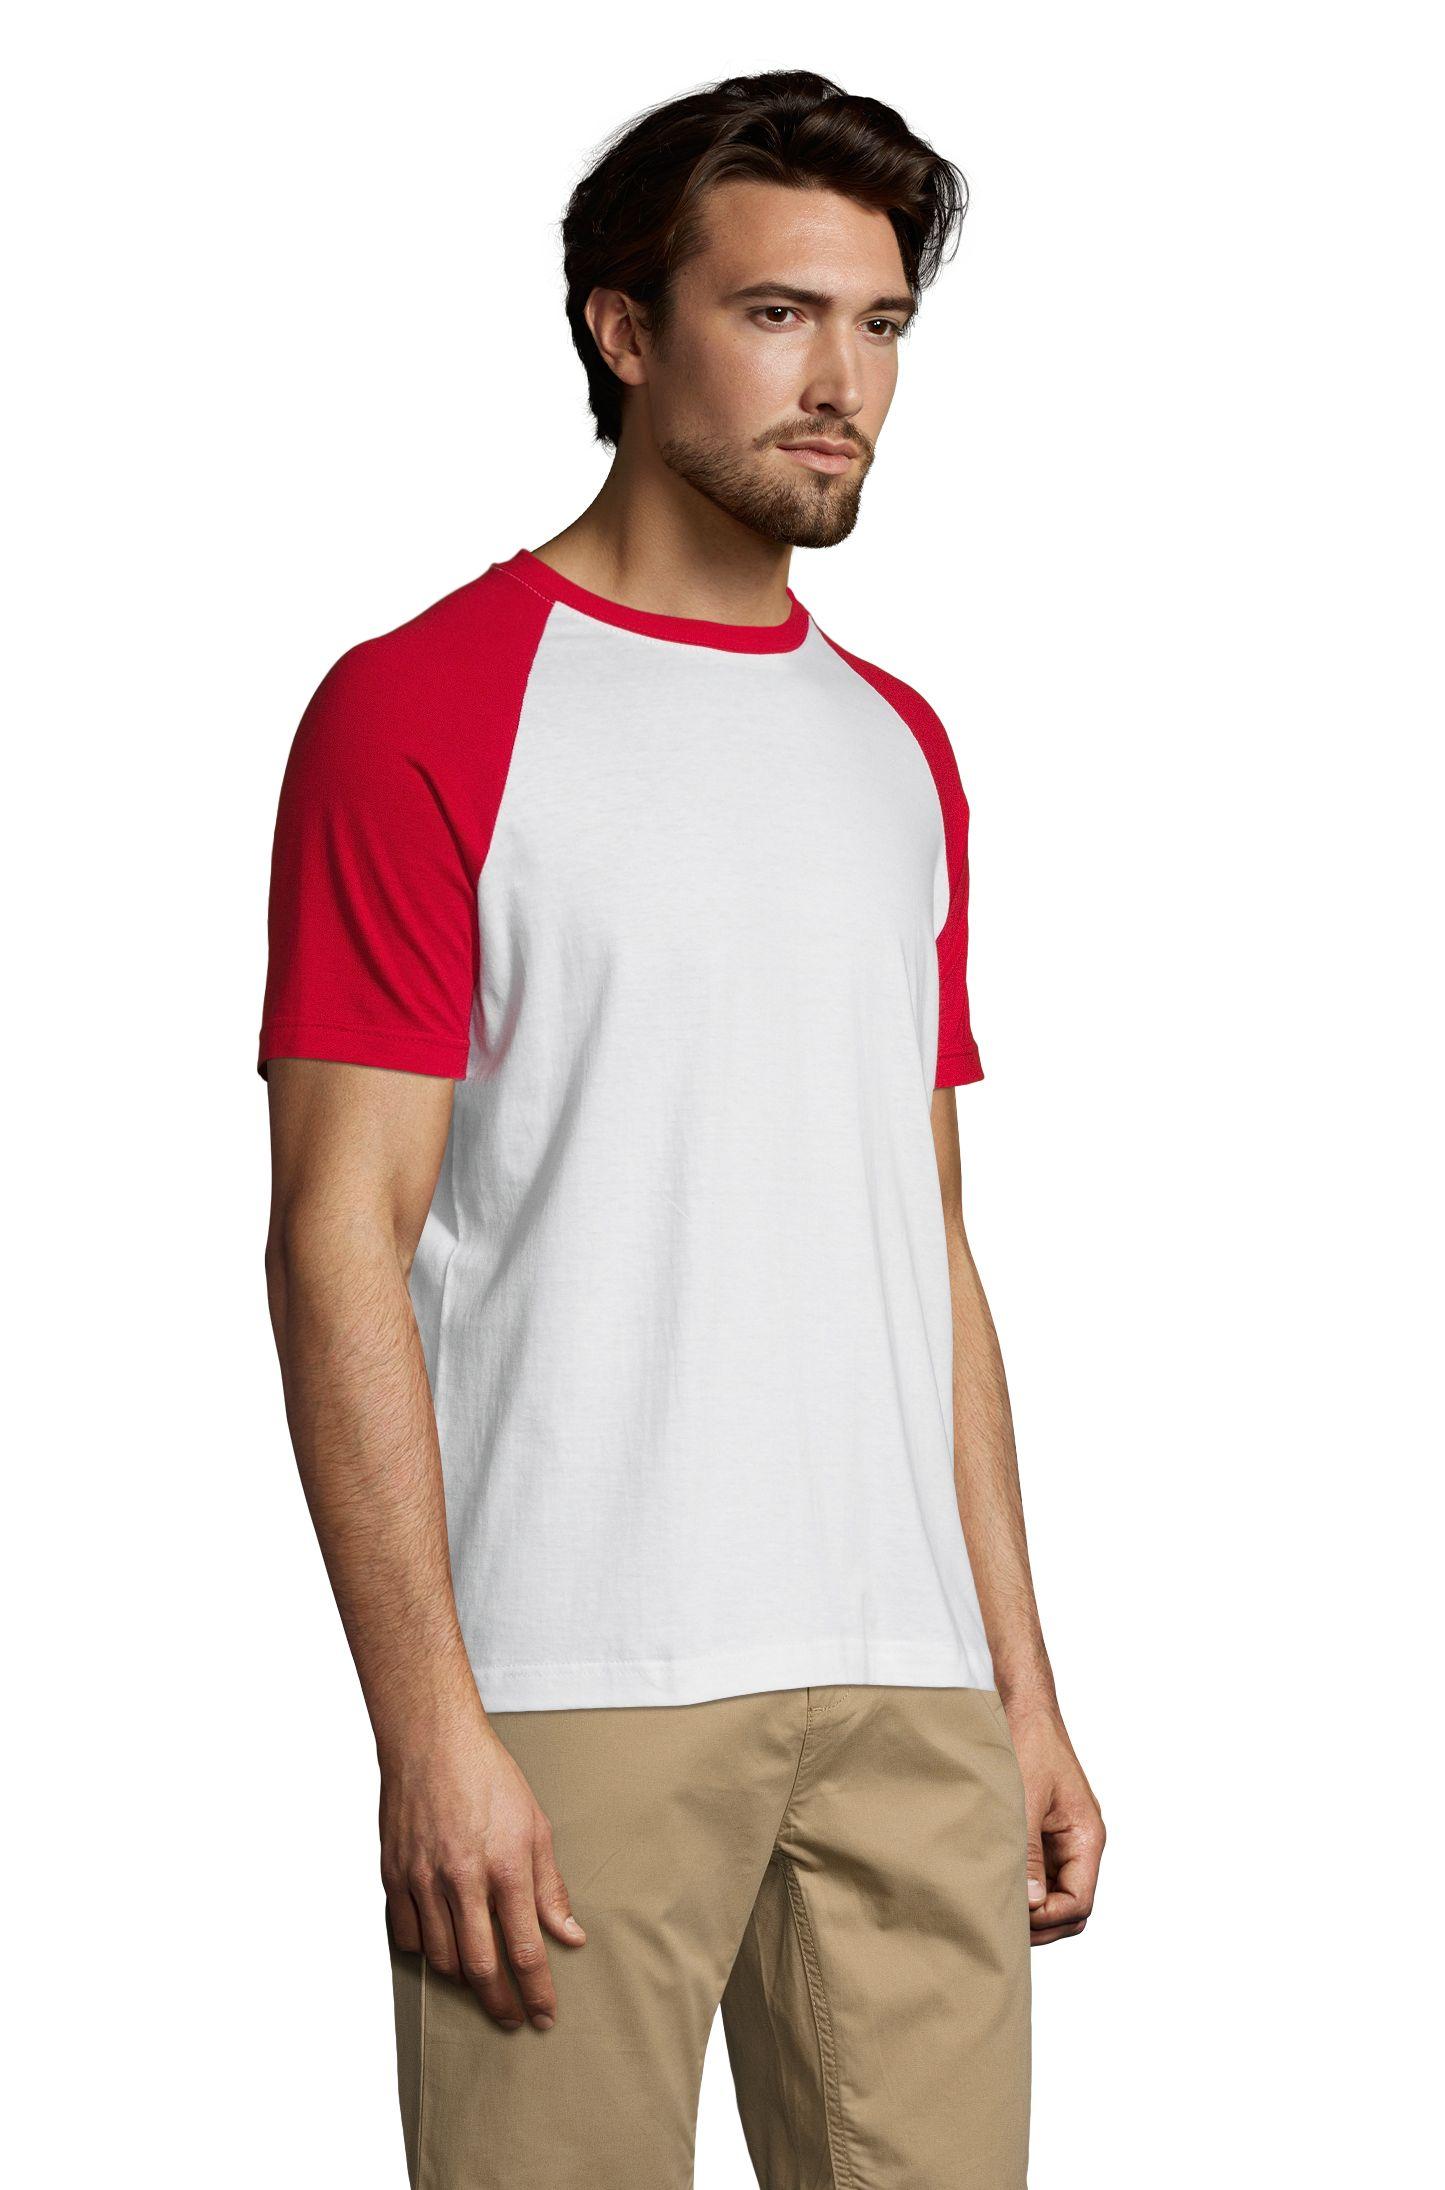 987 - Blanc / Rouge